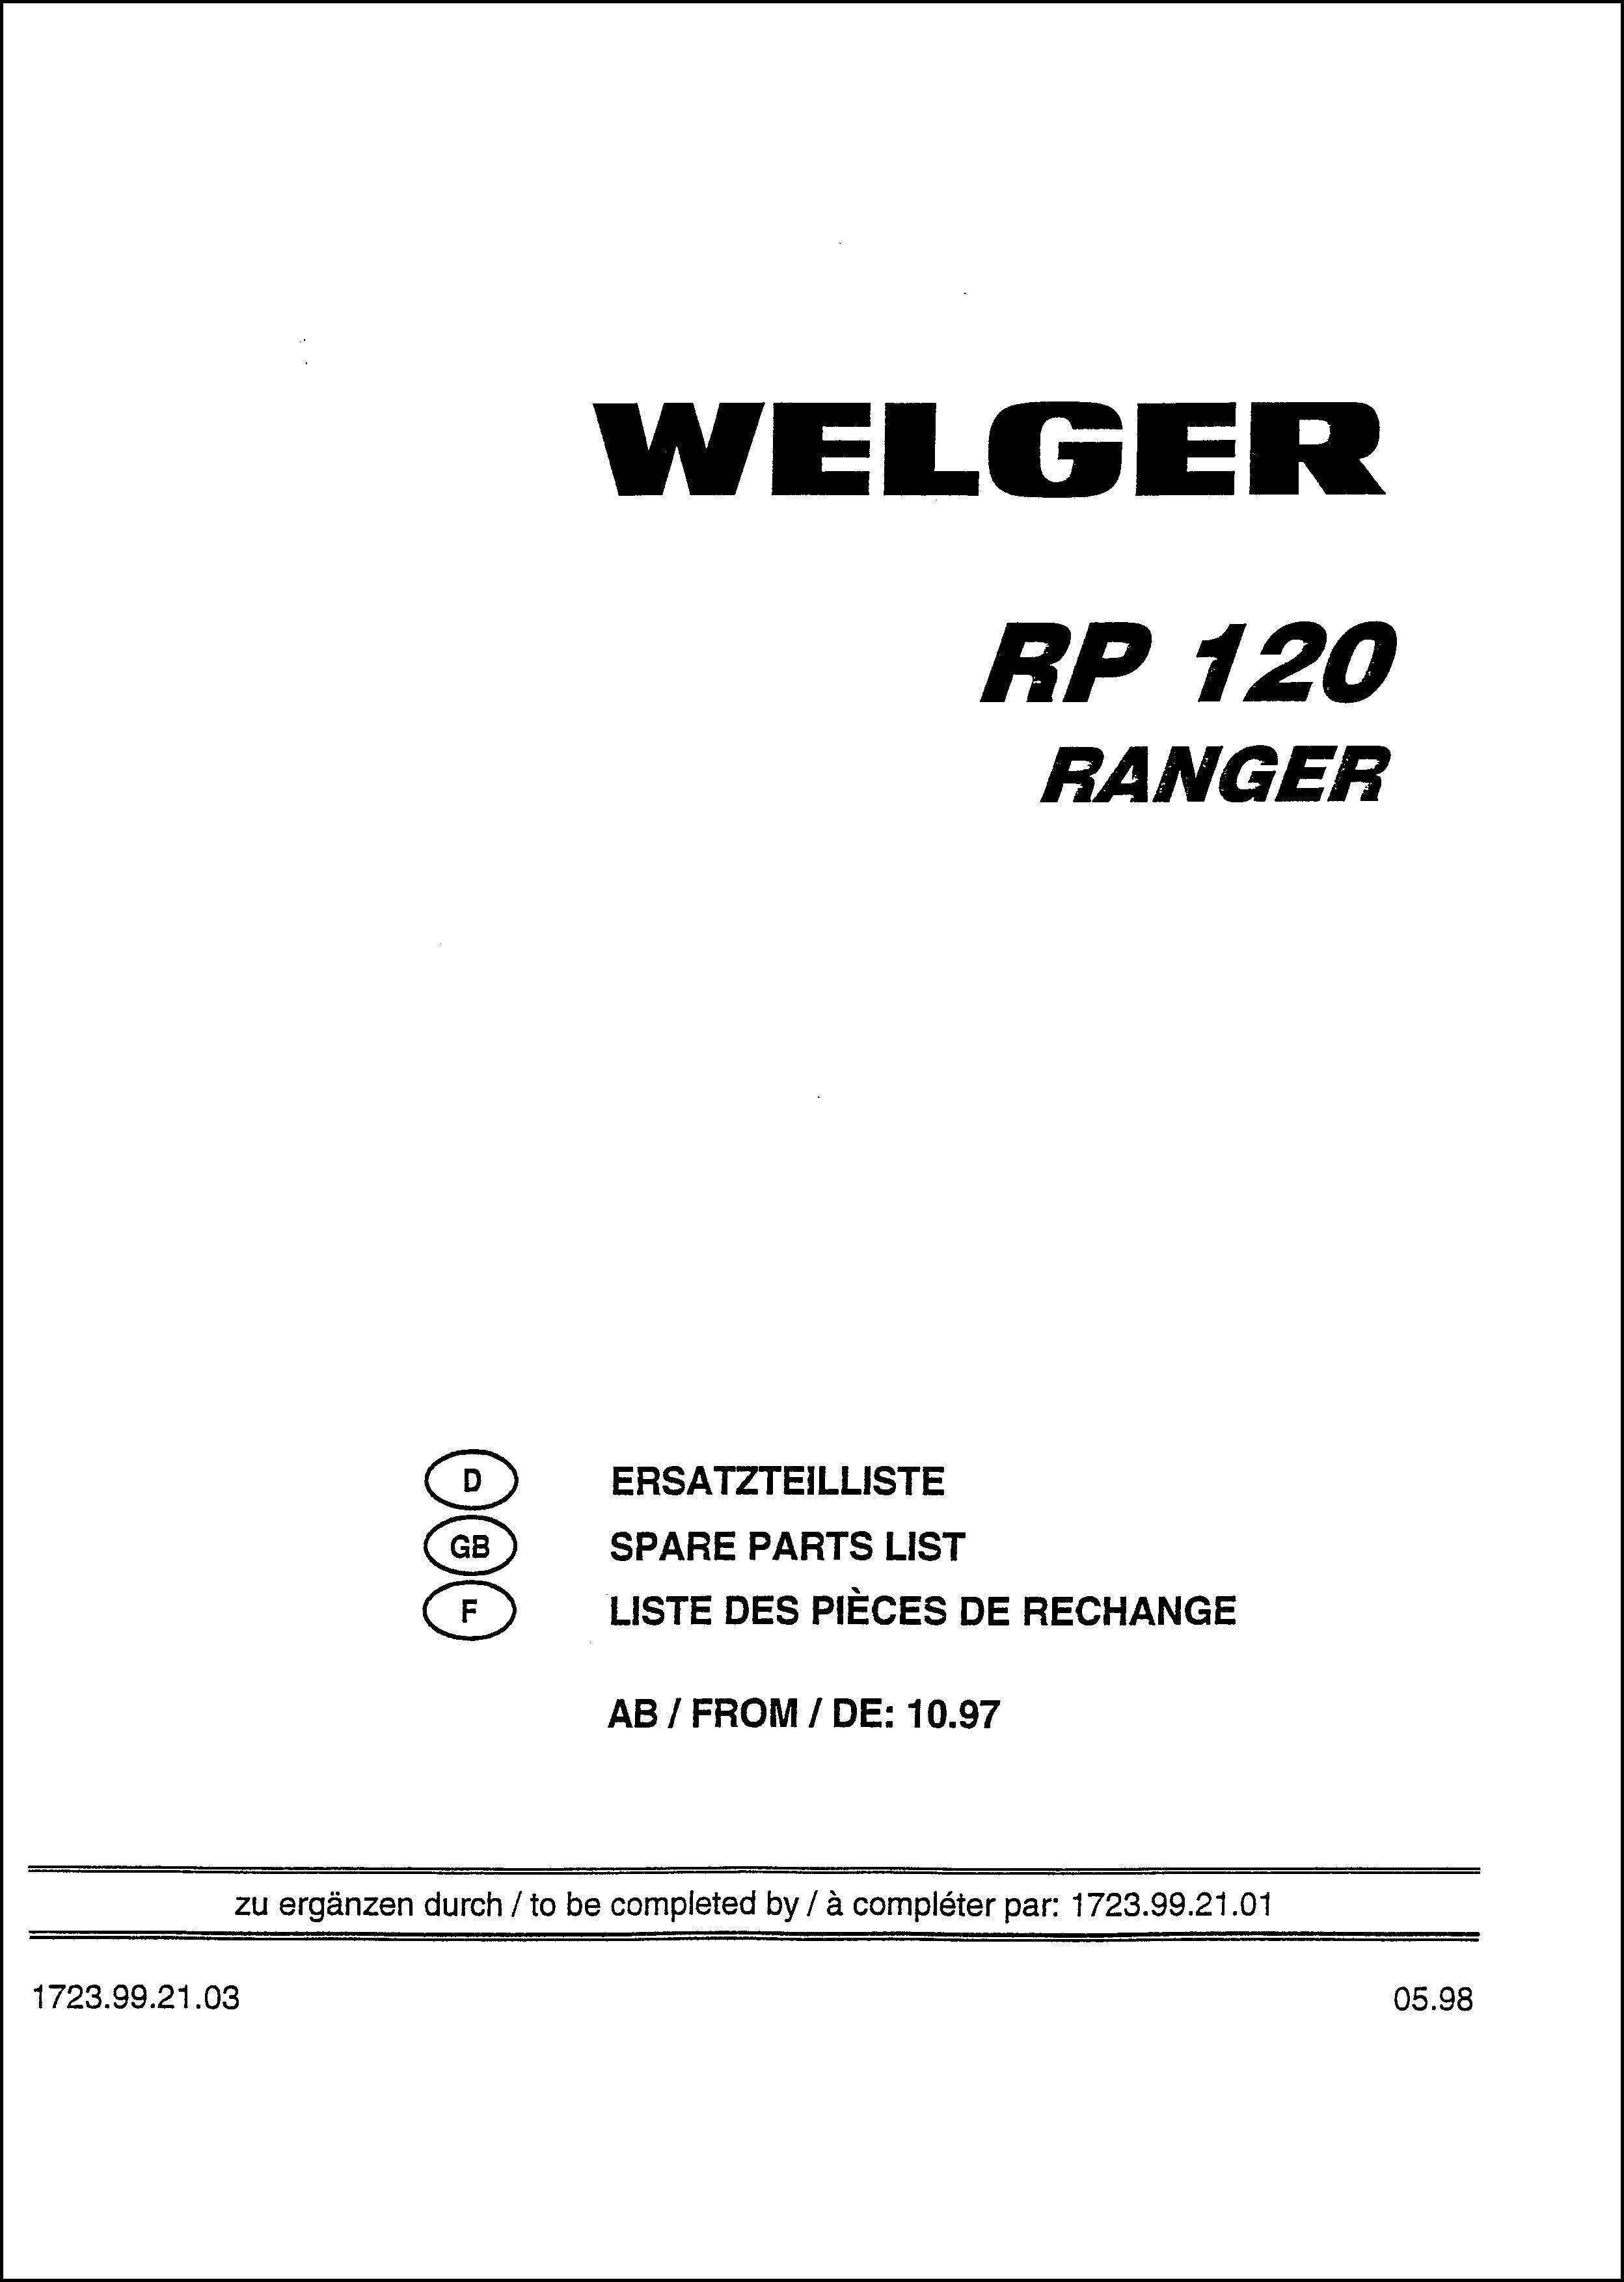 Ford Ranger Parts Catalog Manual Guide